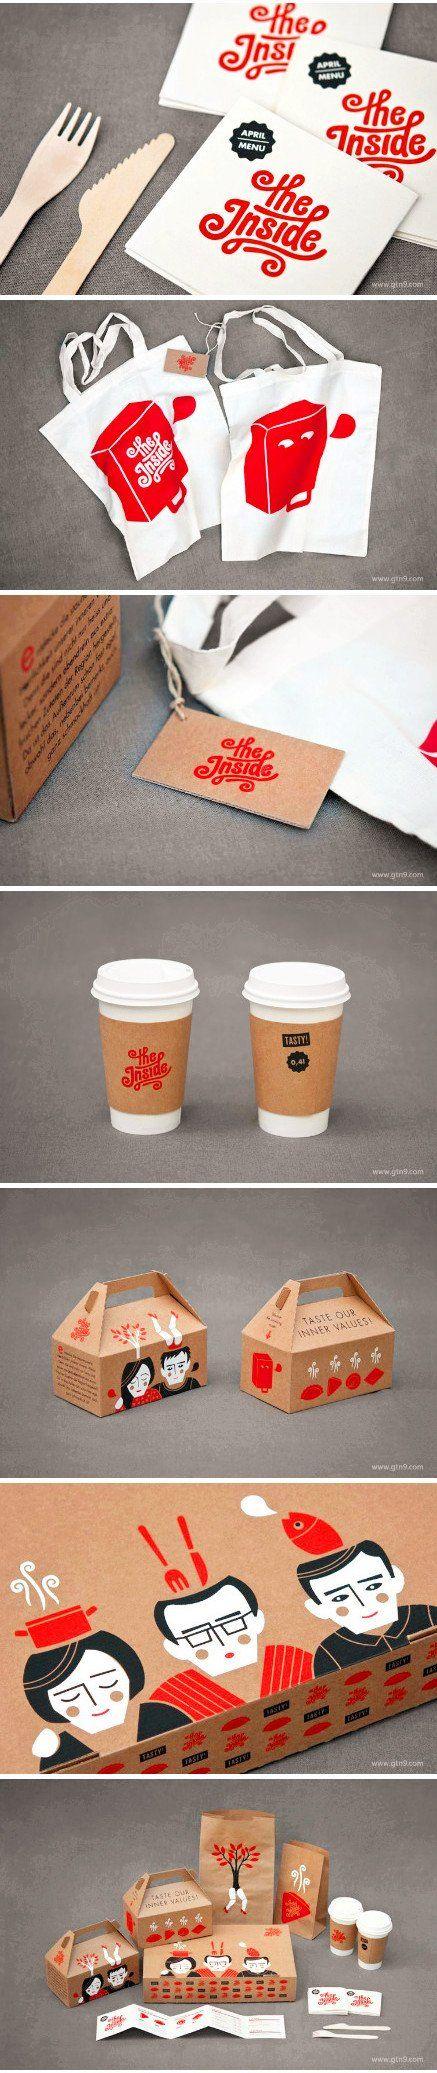 Identity design logo typography packaging